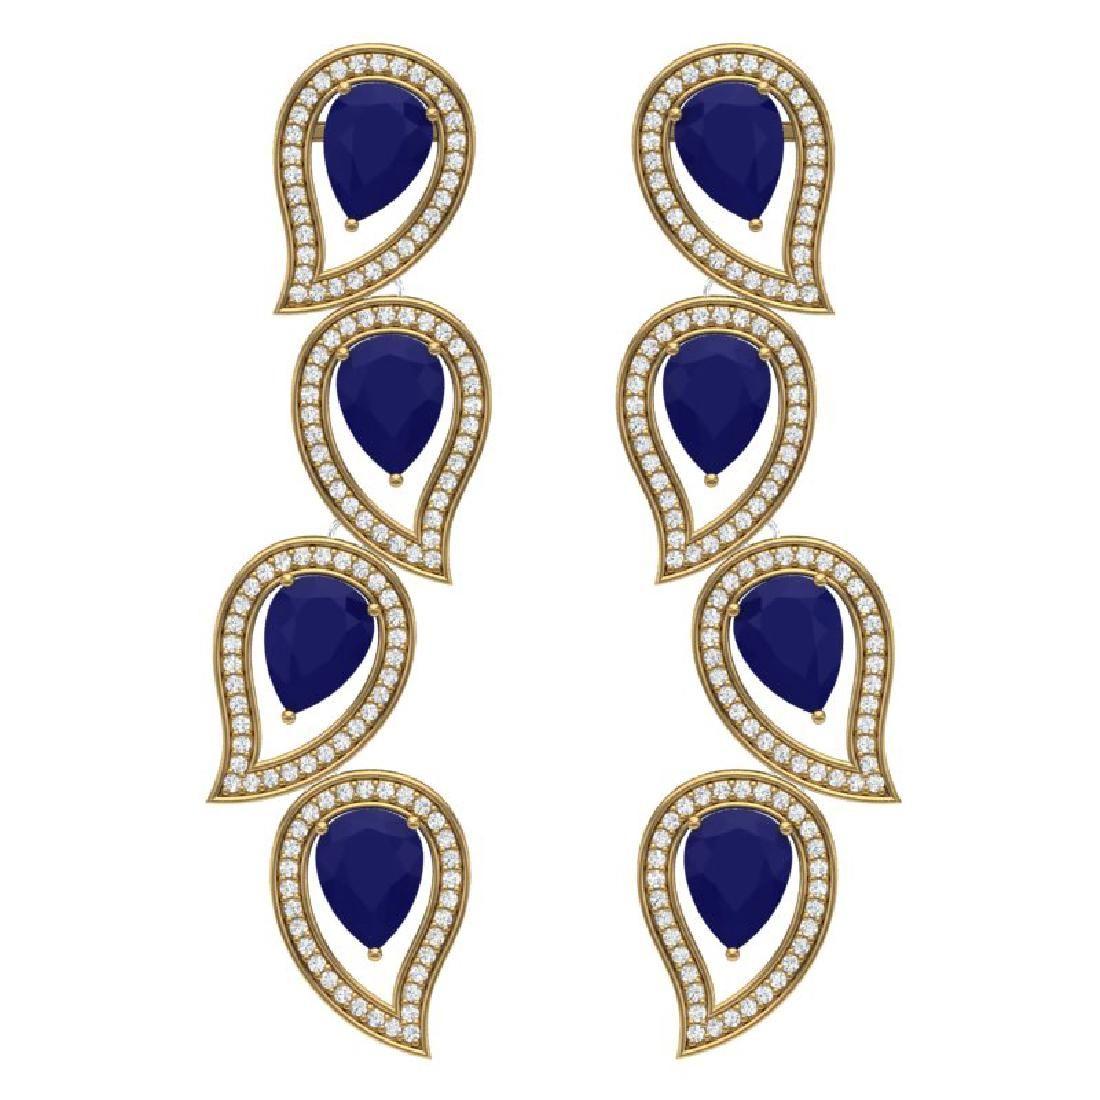 1644 CTW Royalty Sapphire VS Diamond Earrings 18K